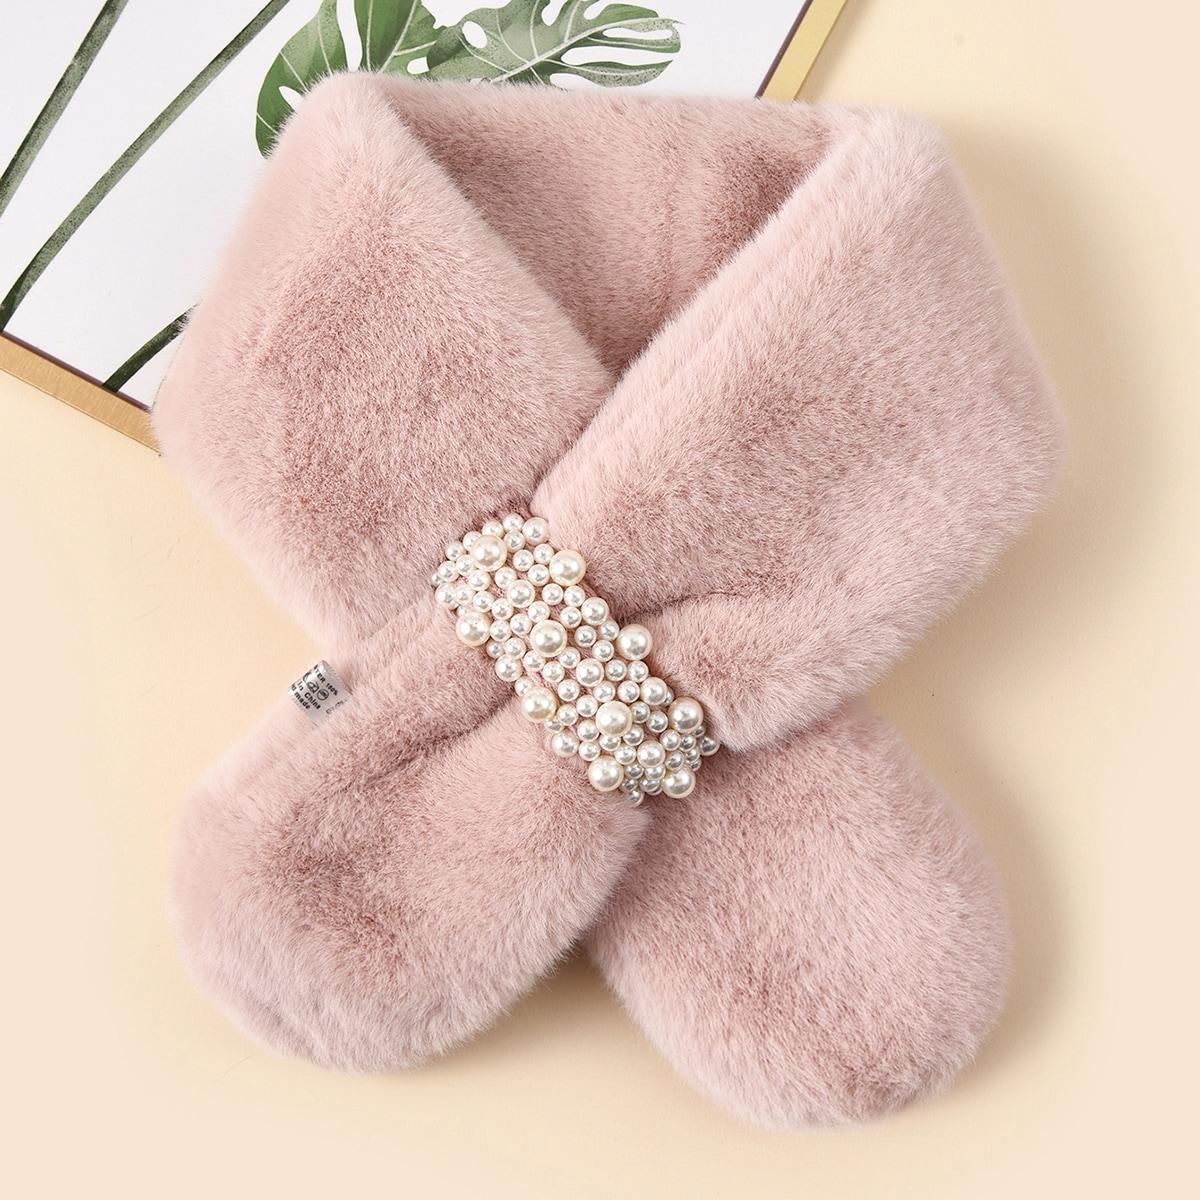 shein Faux Pearl Decor sjaal